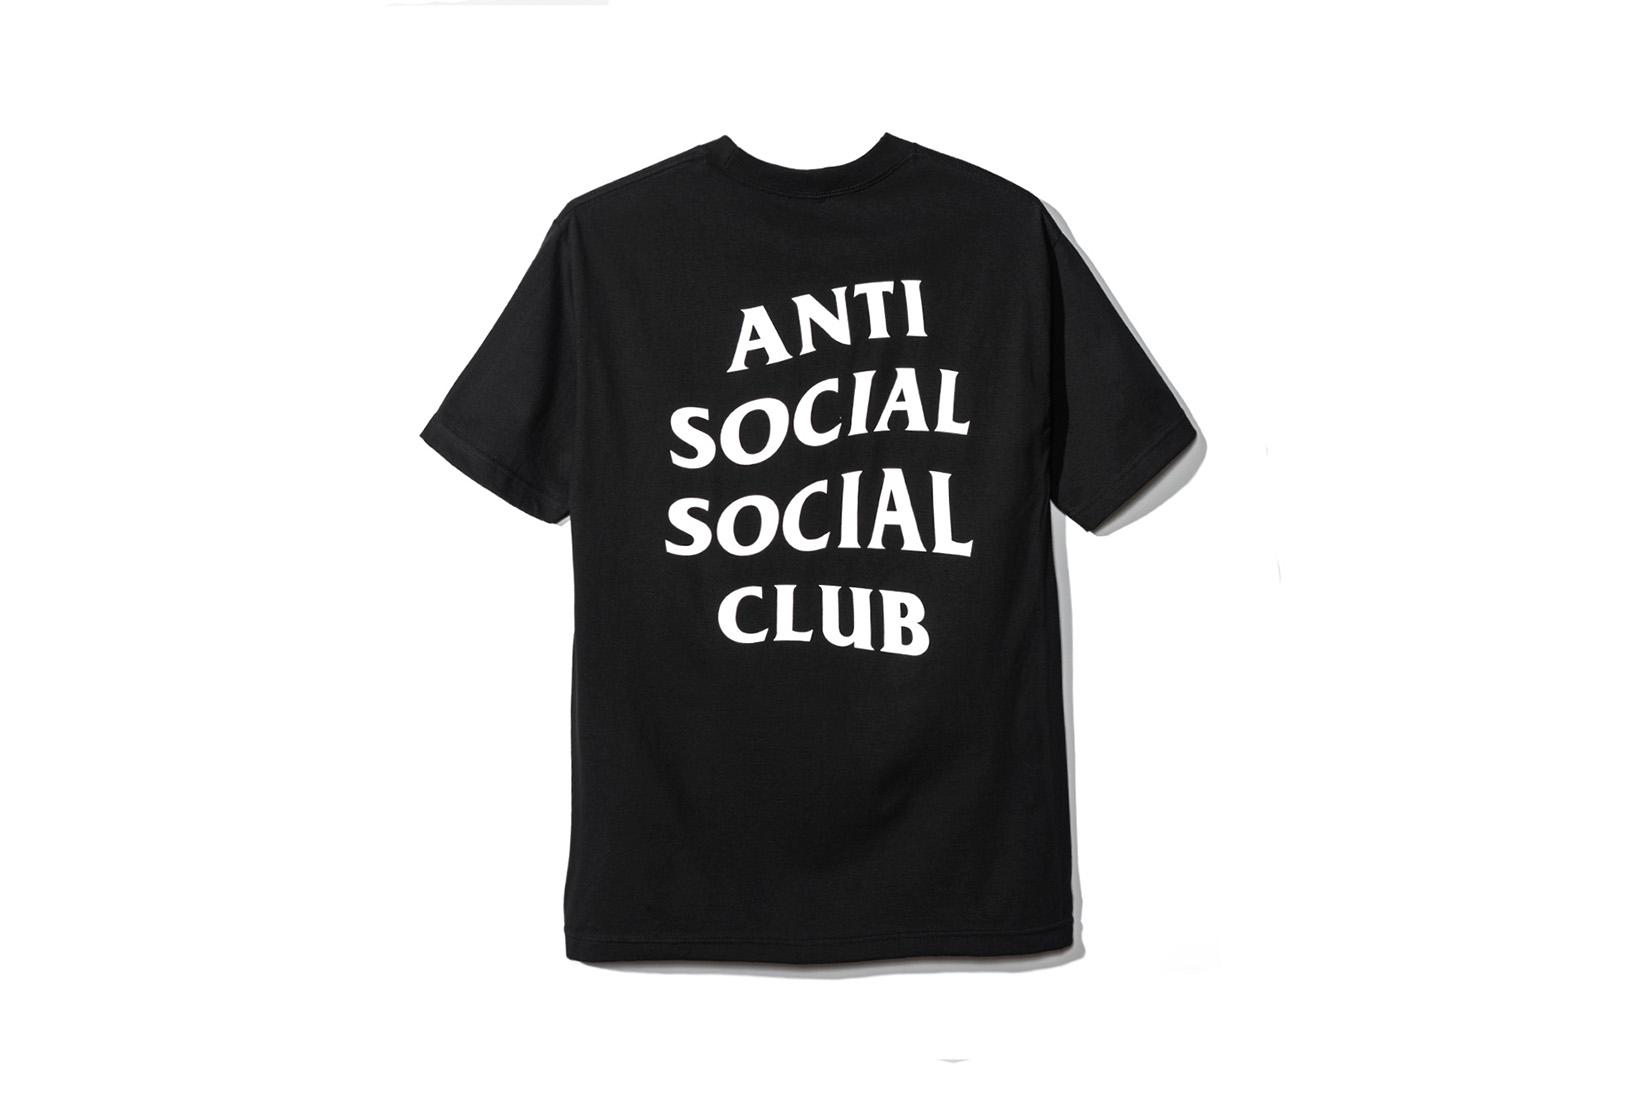 Anti Social Social Club 2017 Spring Summer - 3744351